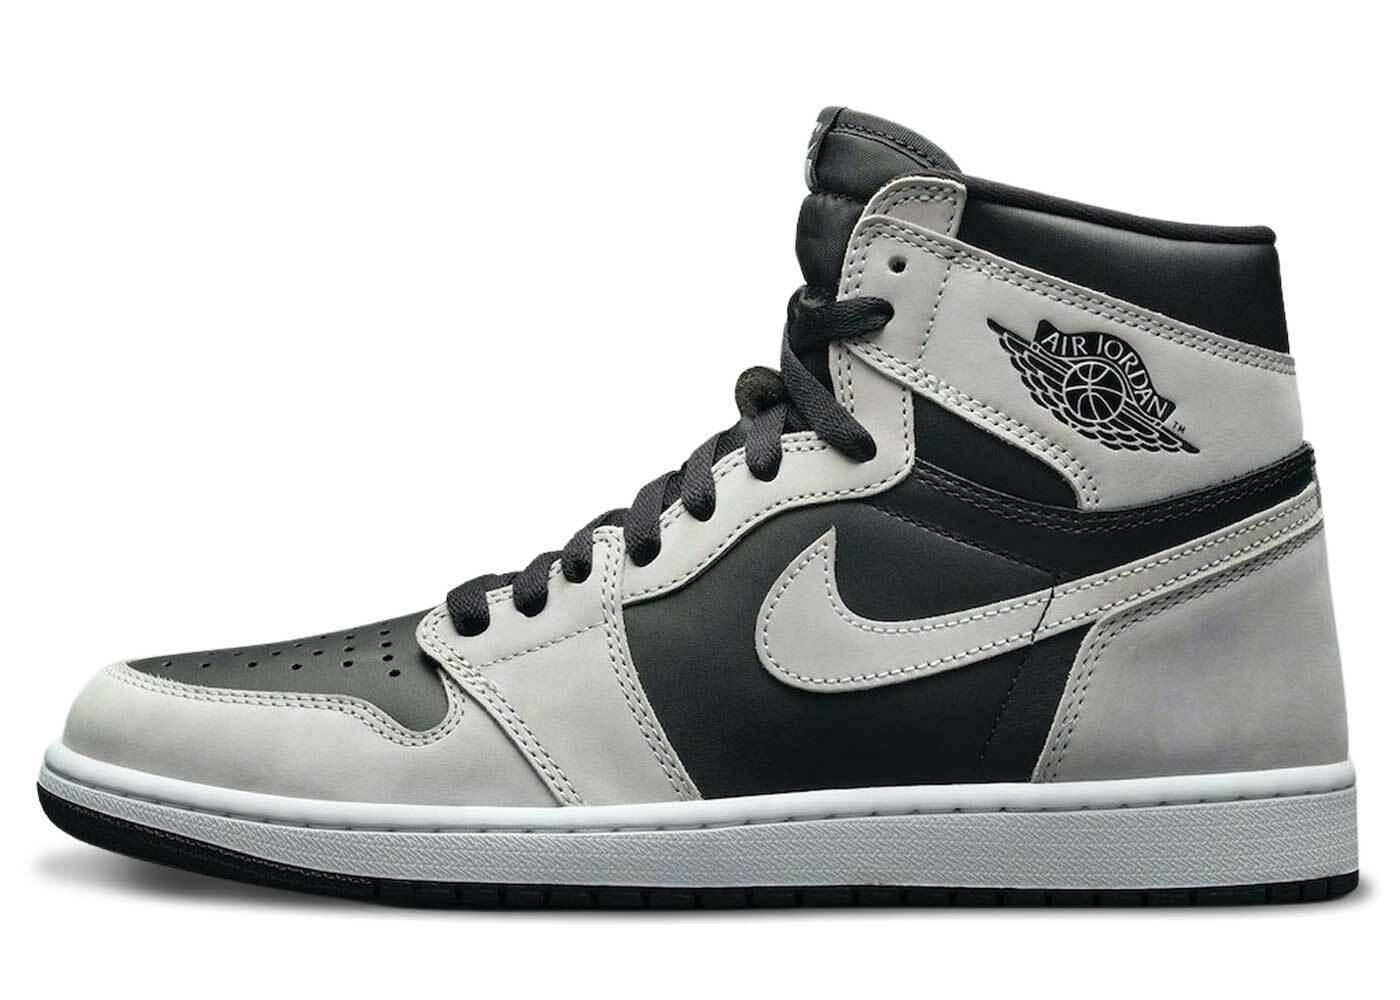 Nike Air Jordan 1 High OG Shadow 2.0の写真